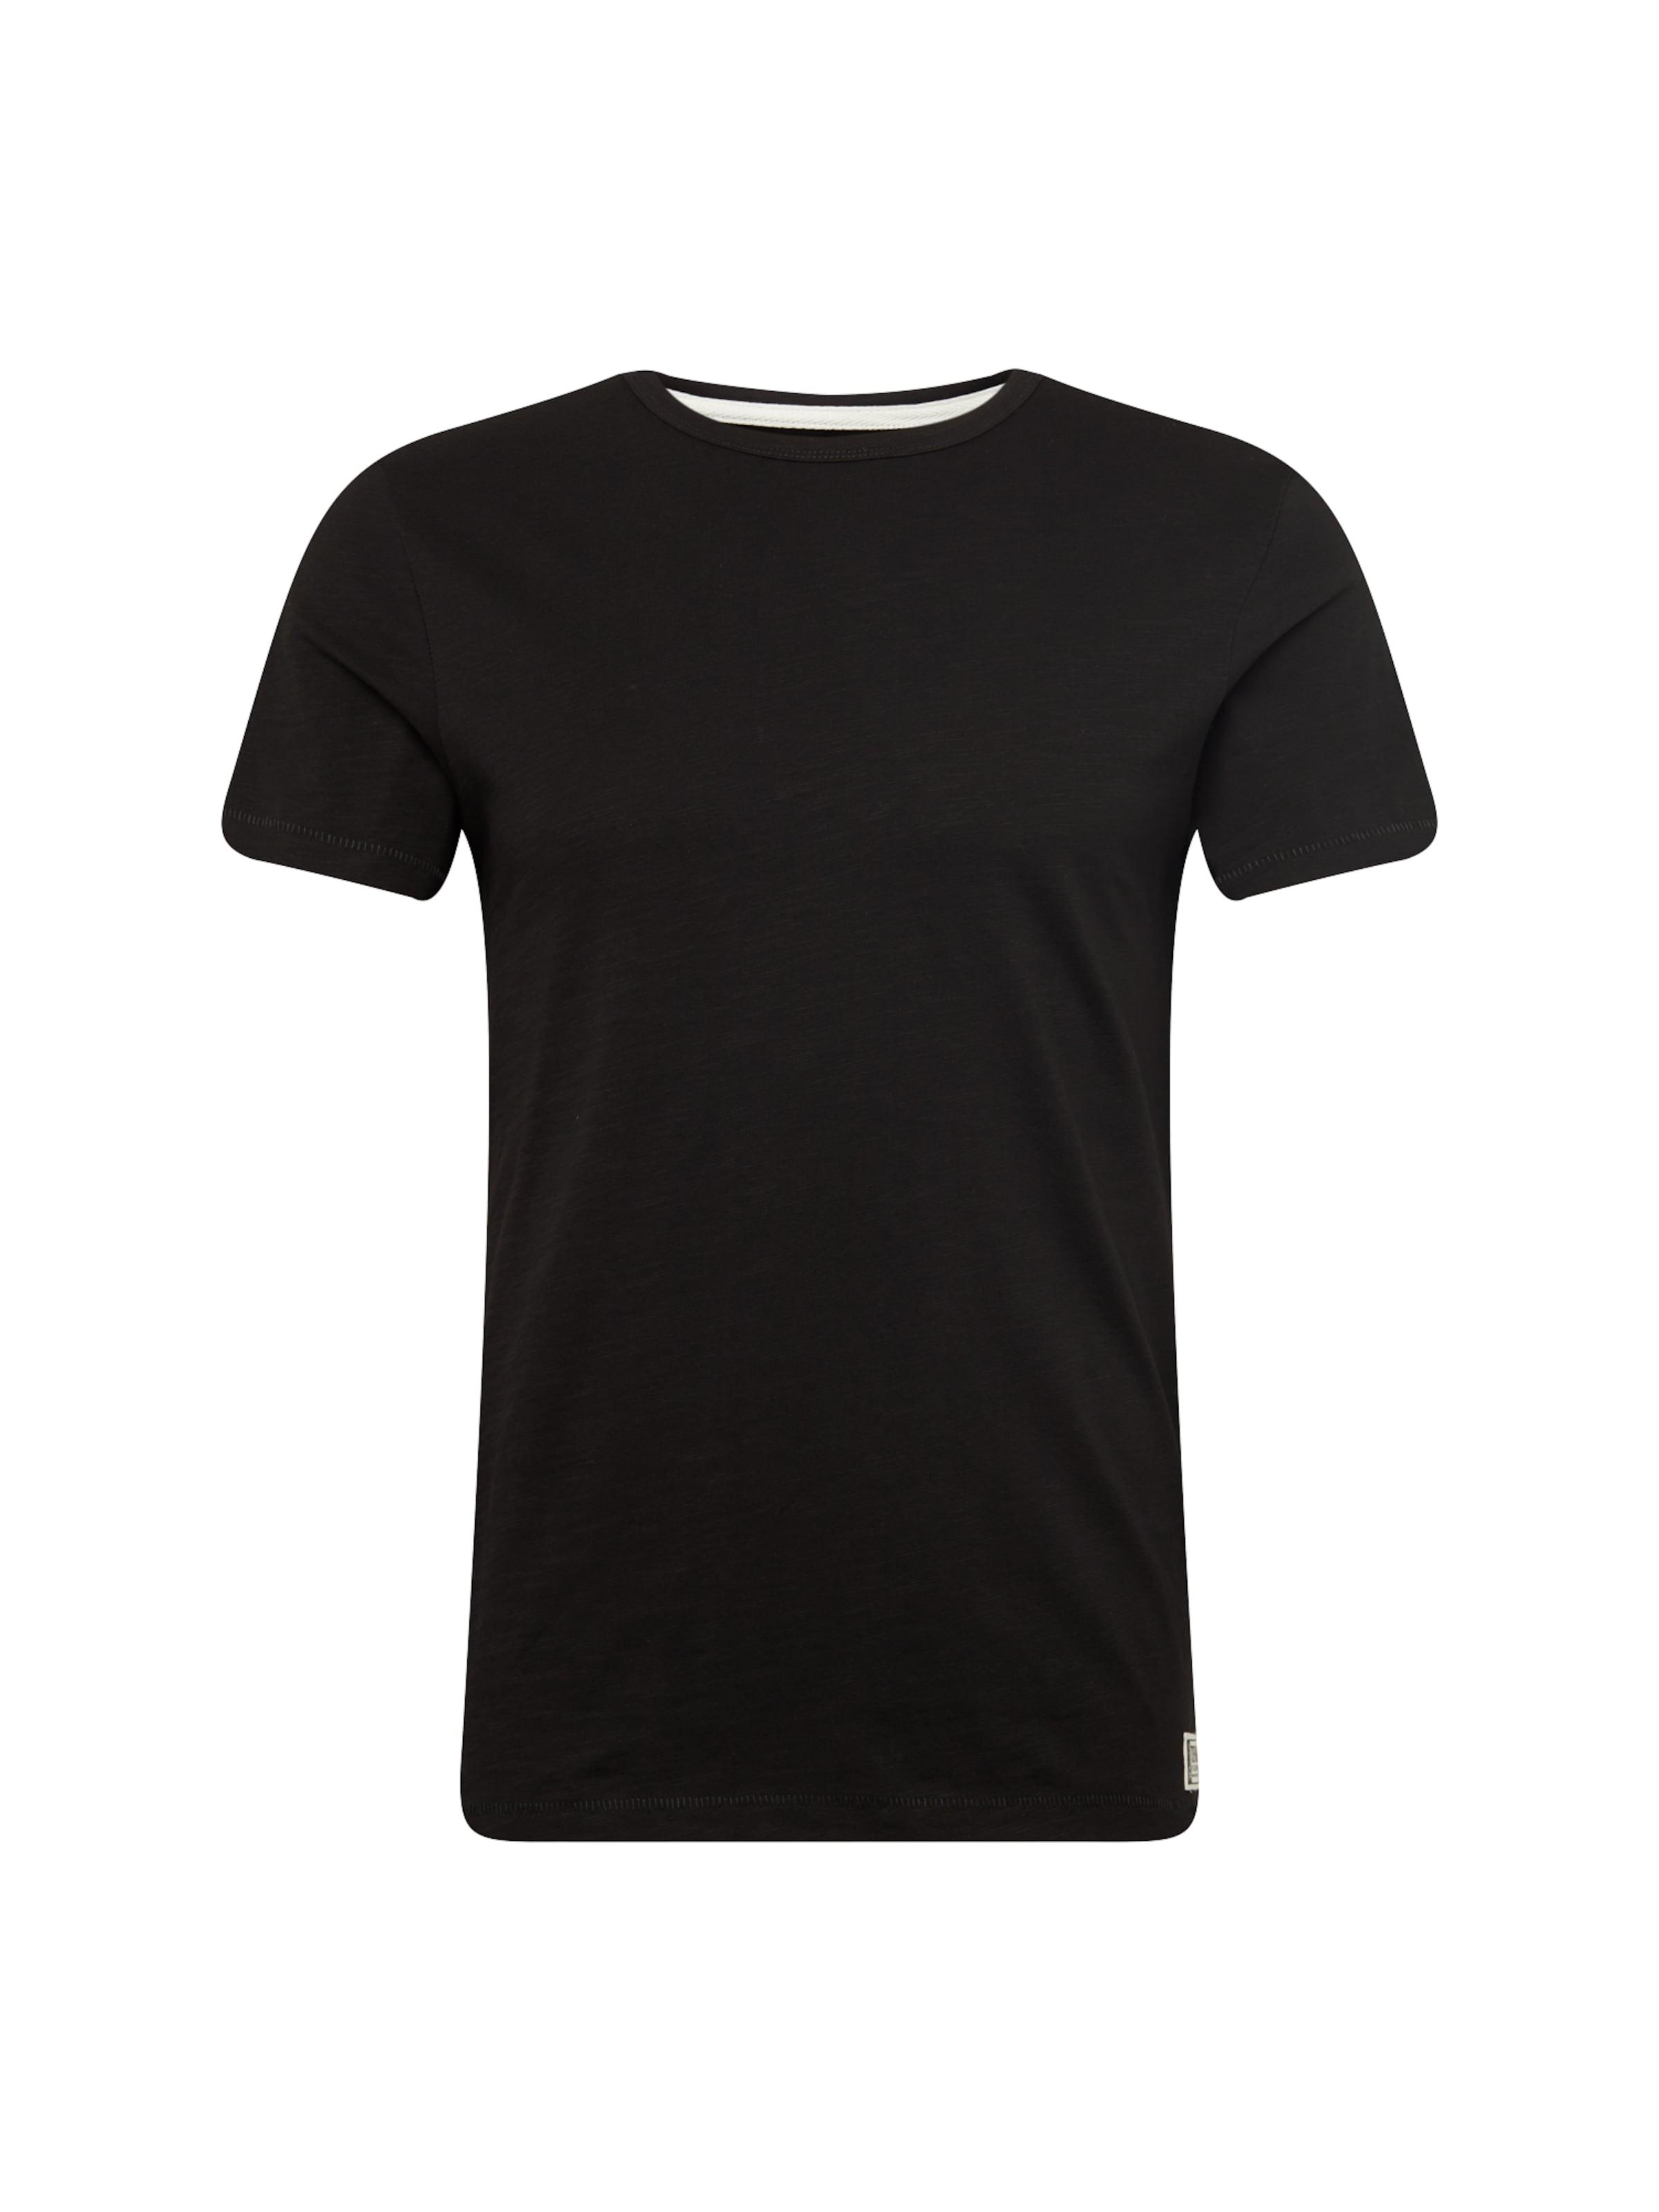 Denim Tailor Shirt Schwarz In Tom lTJu1c5FK3